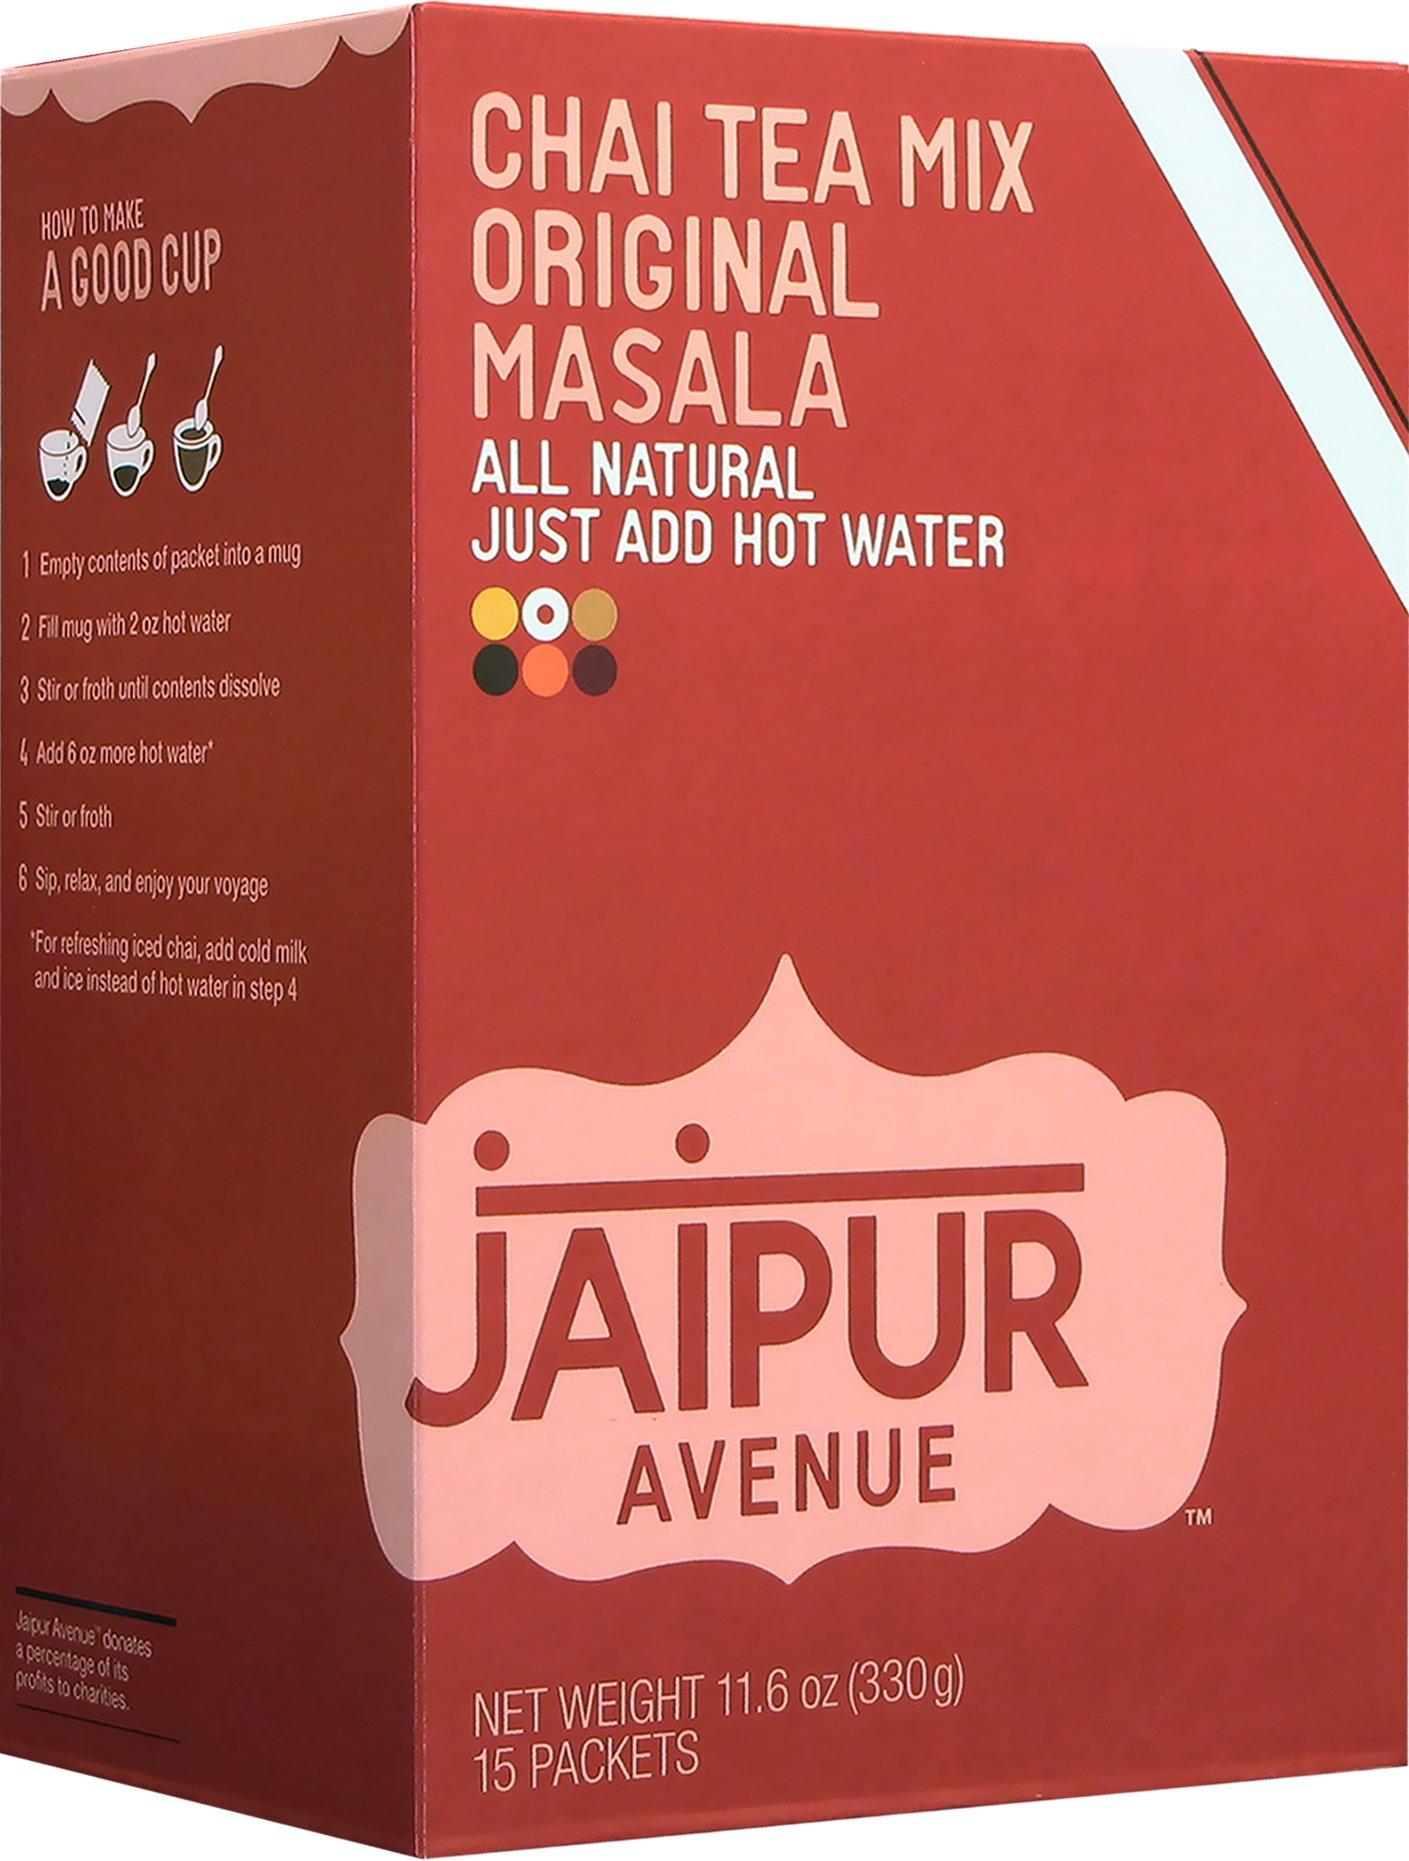 Jaipur Avenue Chai Tea Mix Masala